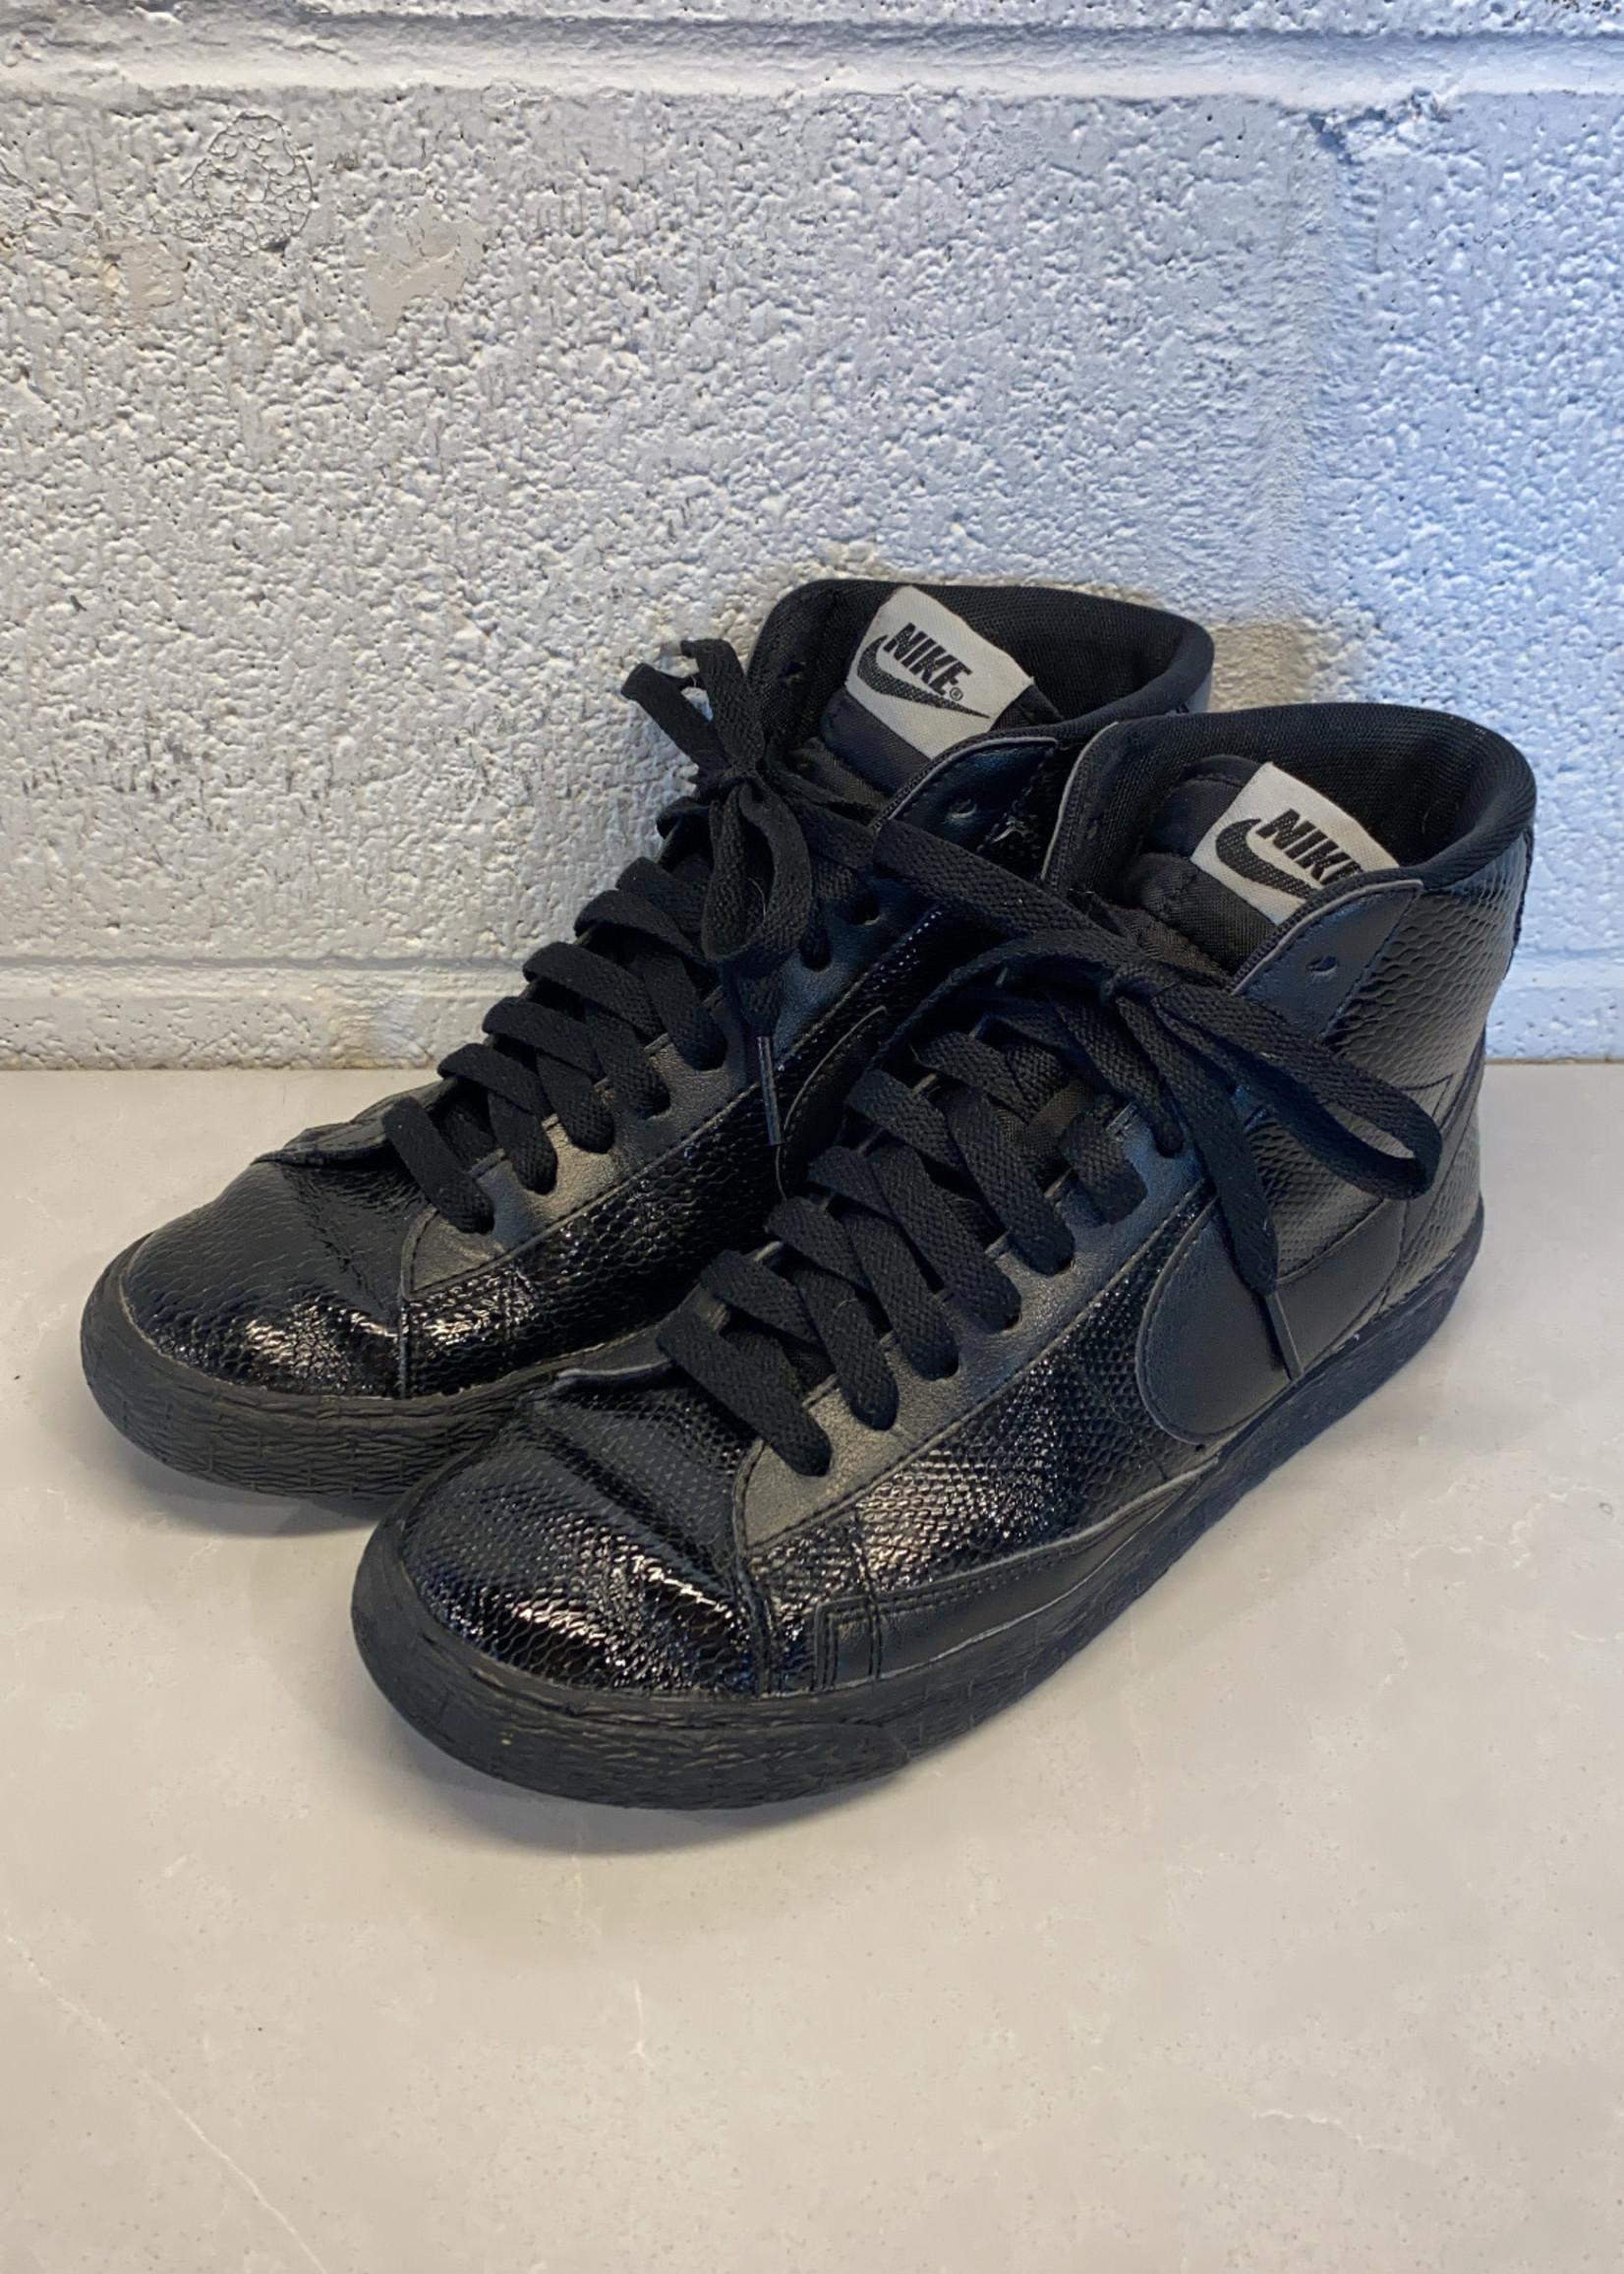 Nike Wmns Blazer Mid Leather Premium 'Black' 7